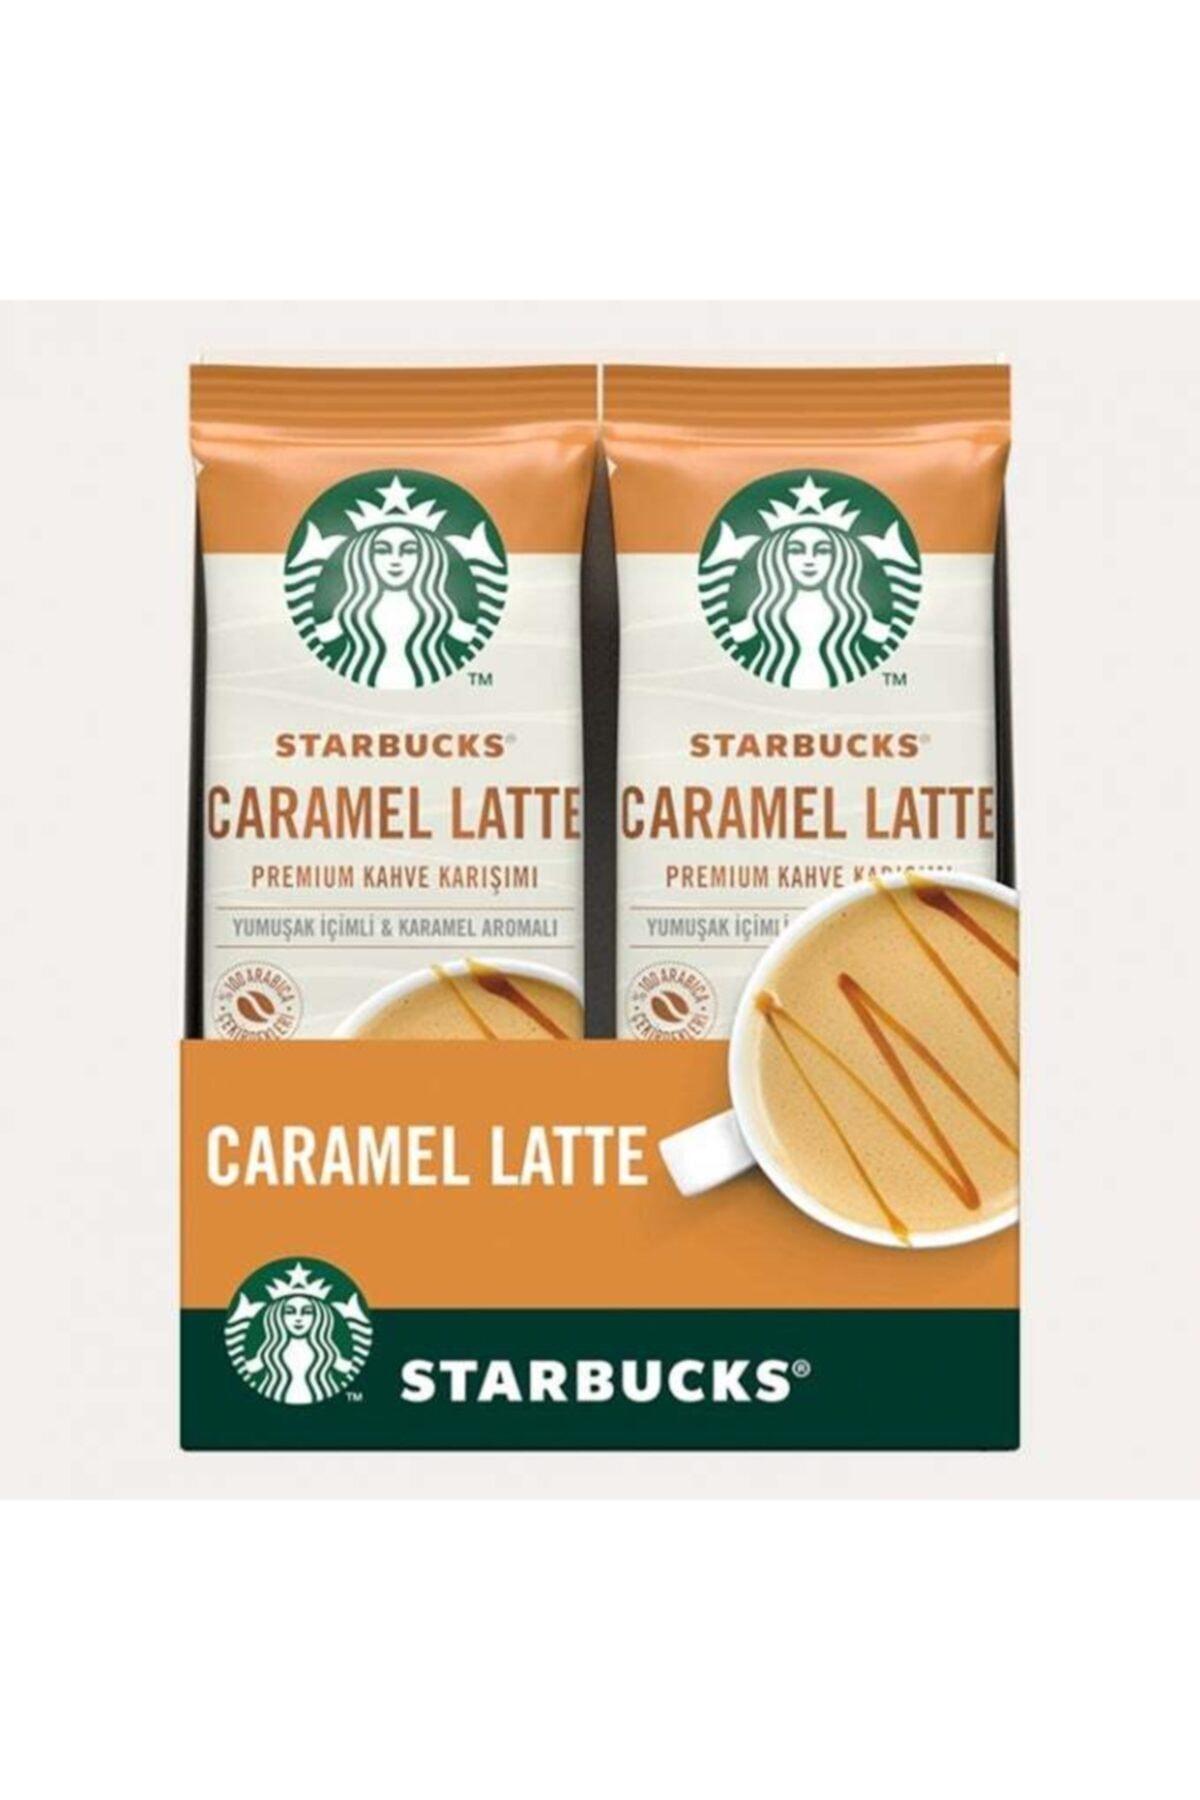 Caramel Latte Premium Kahve Karışımı 21.5 Gr X 10 Paket